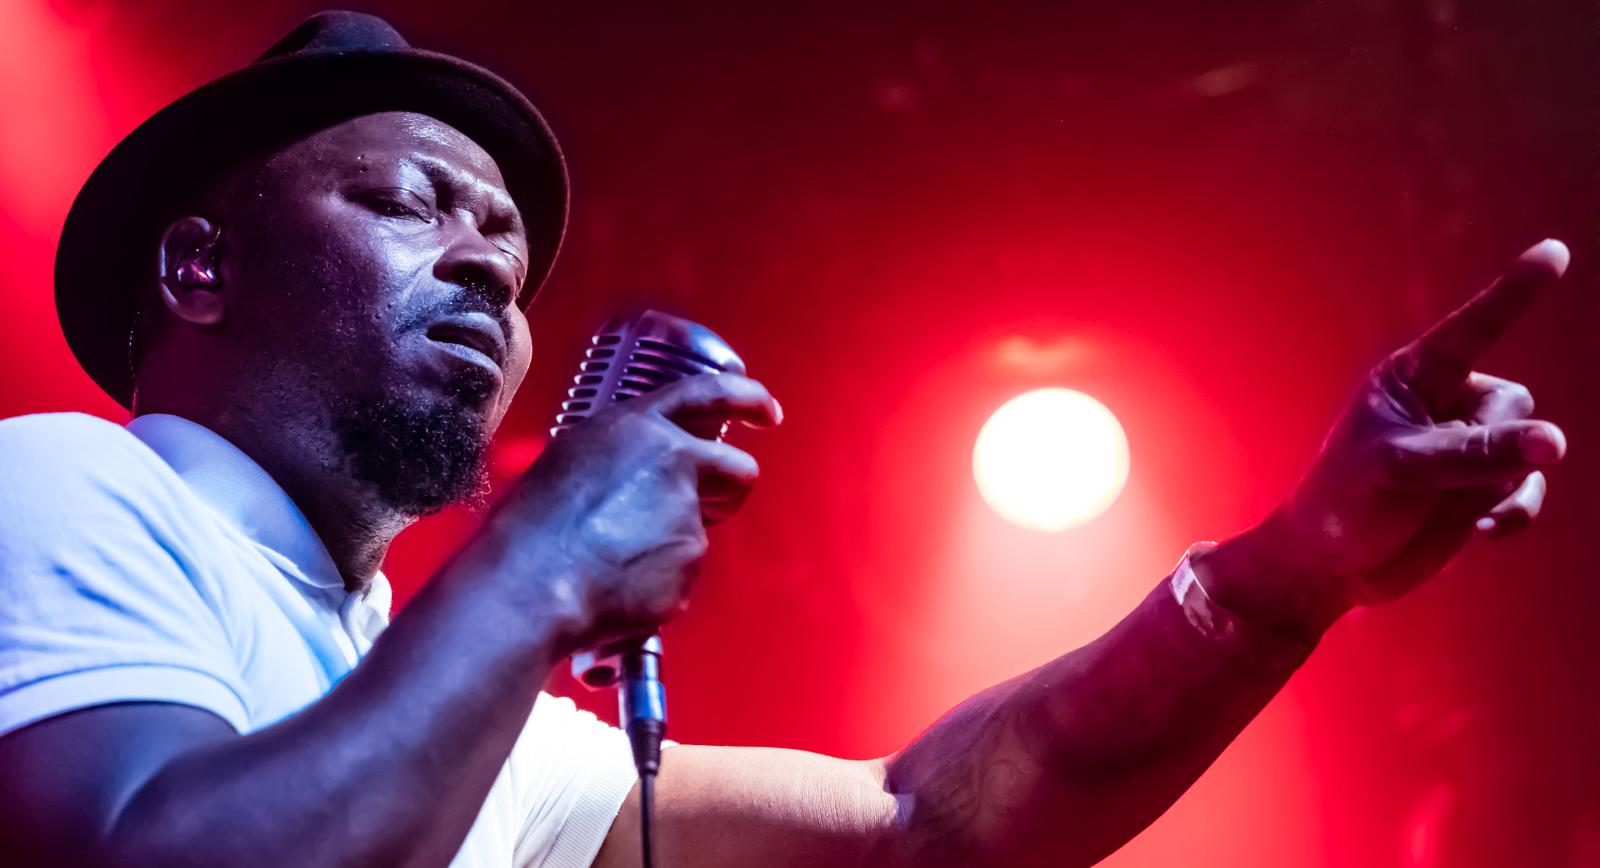 The-Heavy-2016-Tour-Concert-Review-Photos-San-Francisco-FI